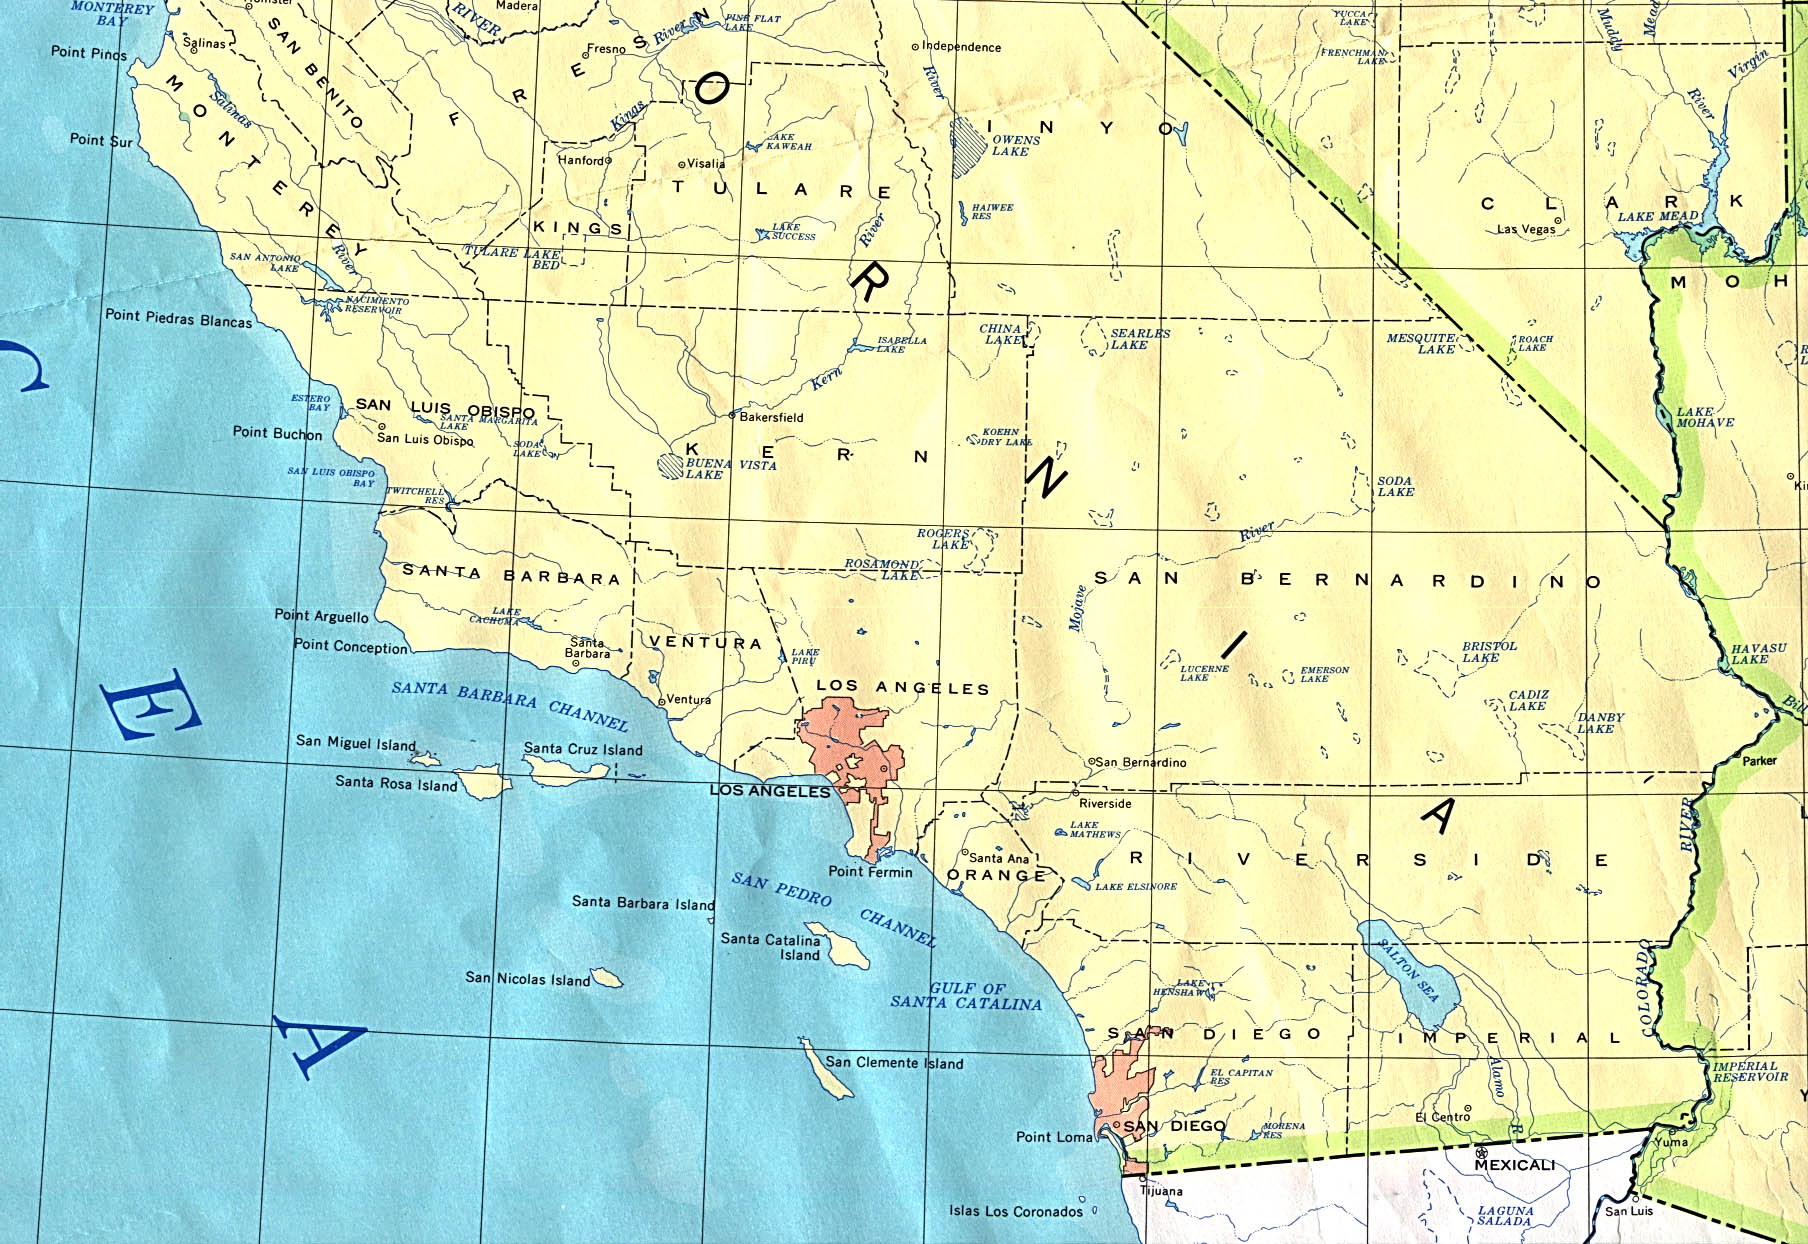 Southern California Rivers Map - Klipy - Southern California Rivers Map